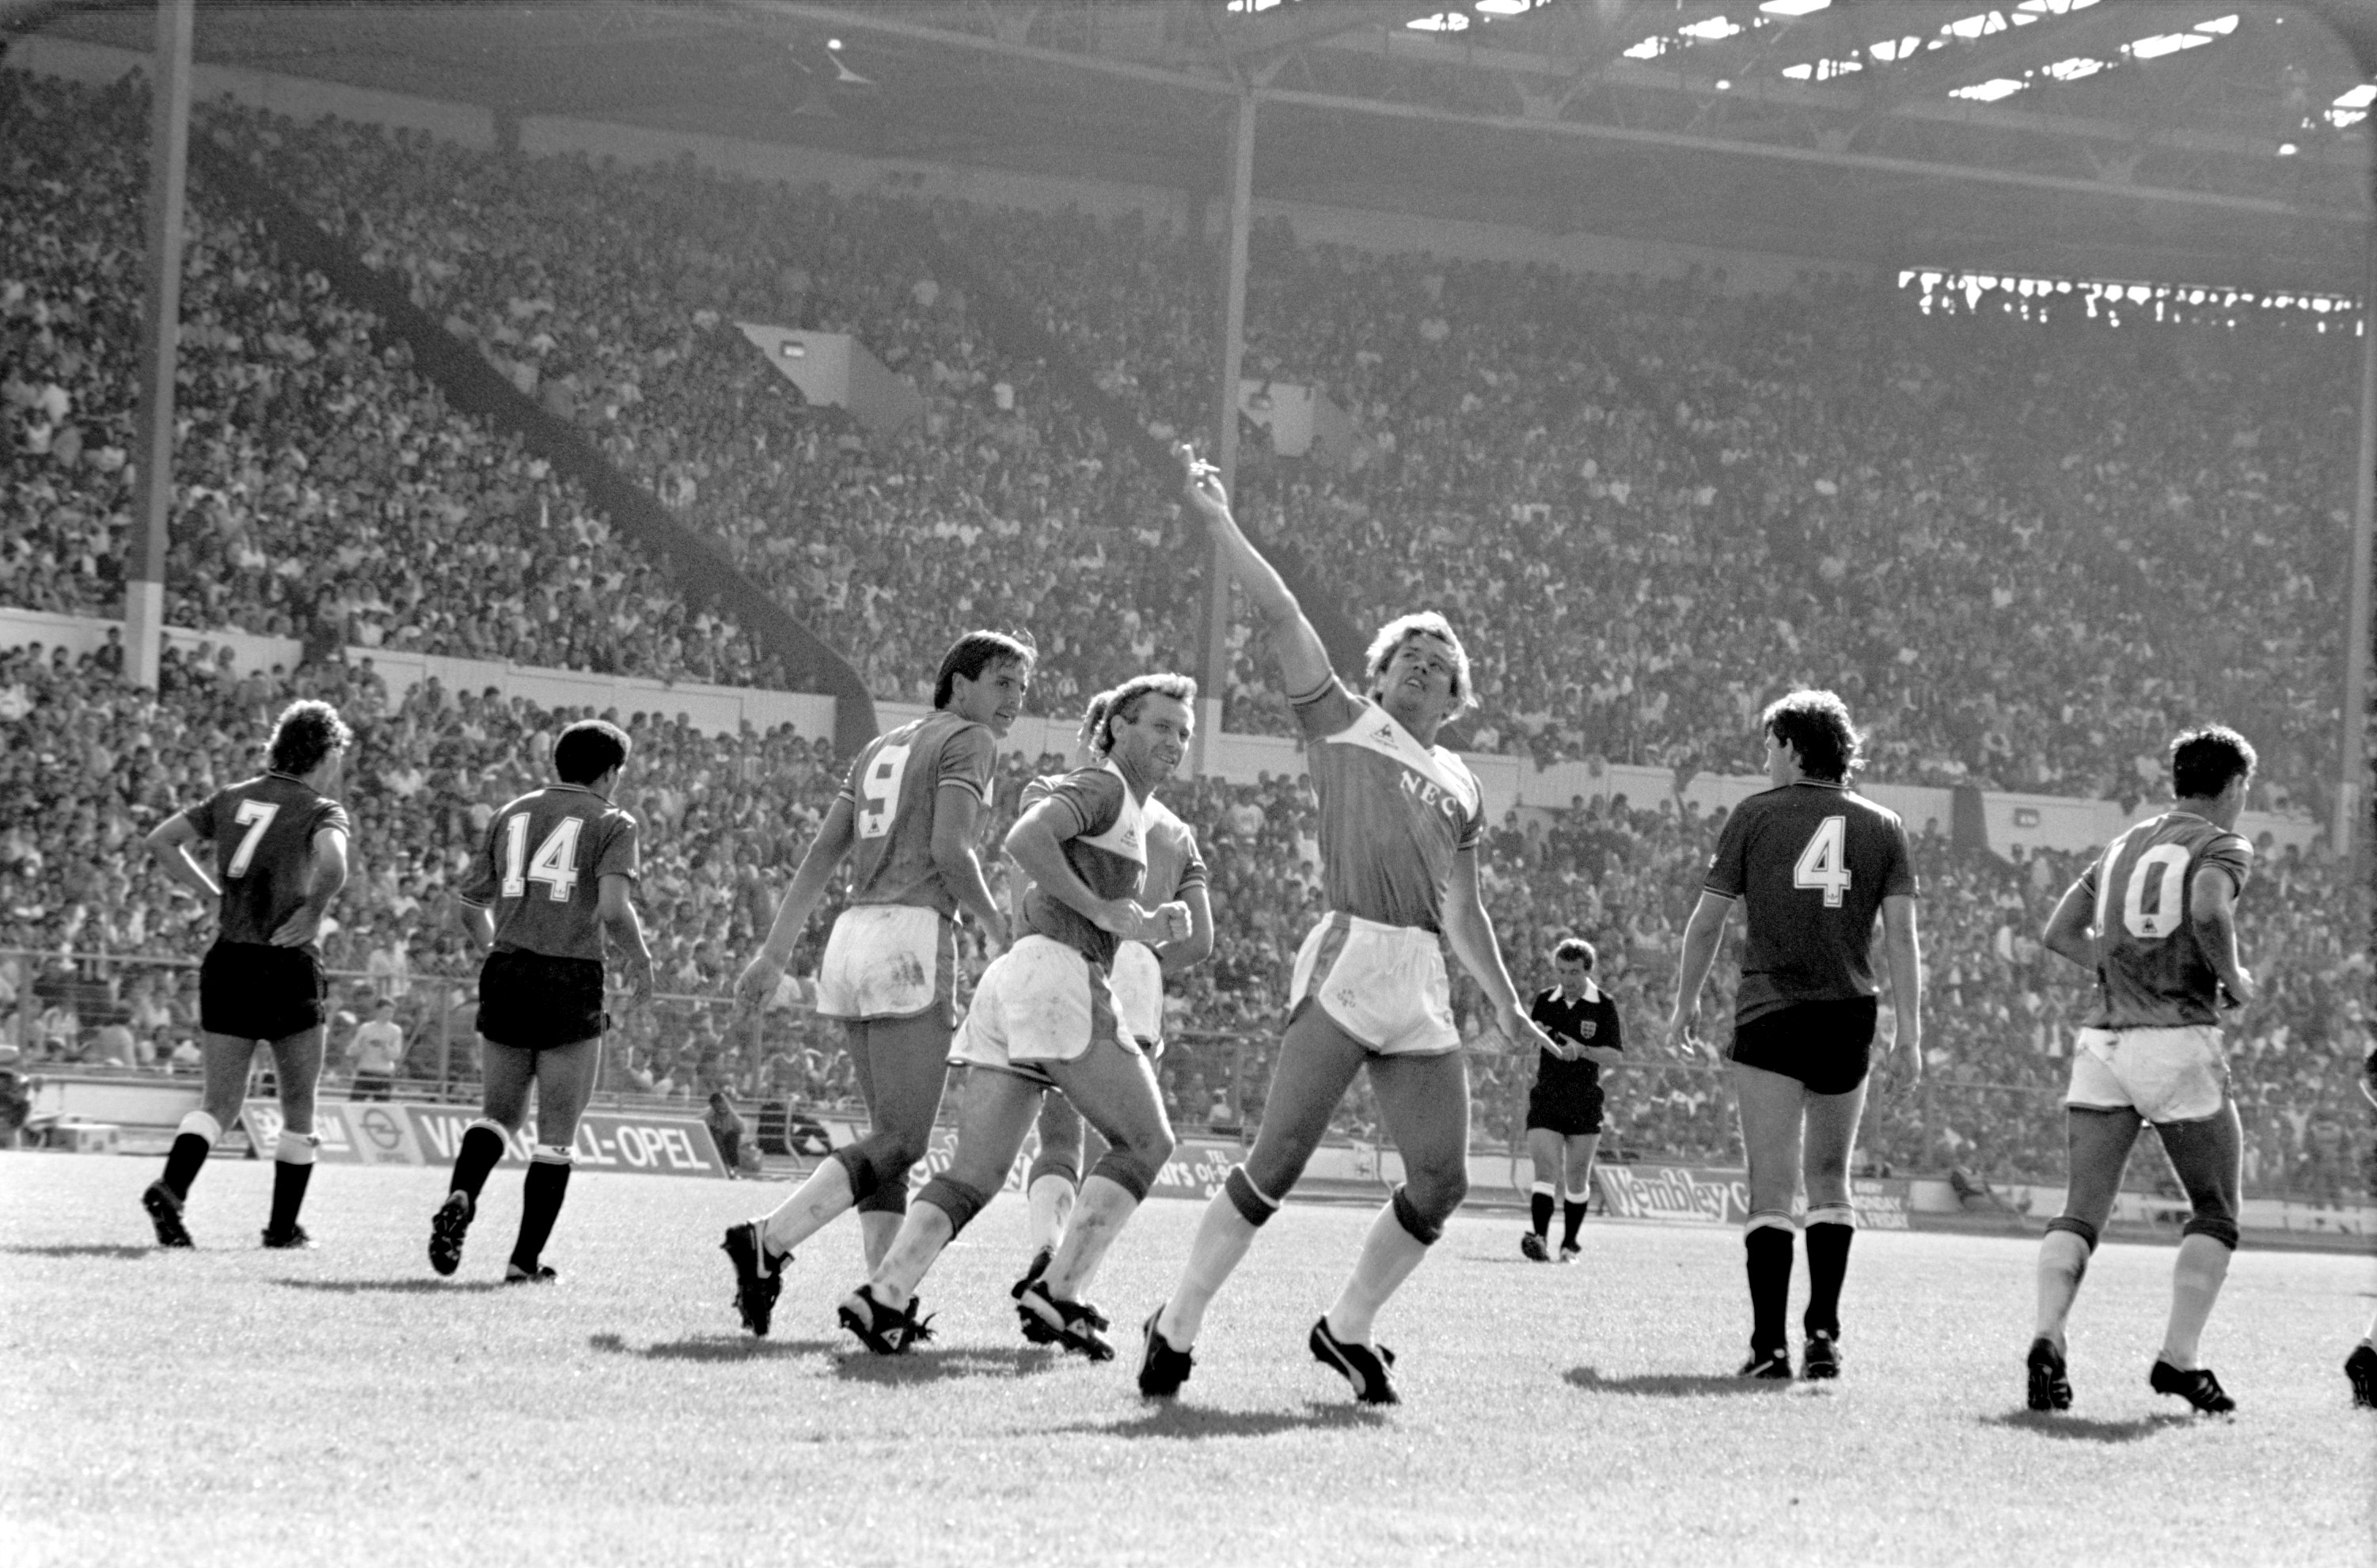 Soccer - FA Charity Shield - Everton v Manchester United